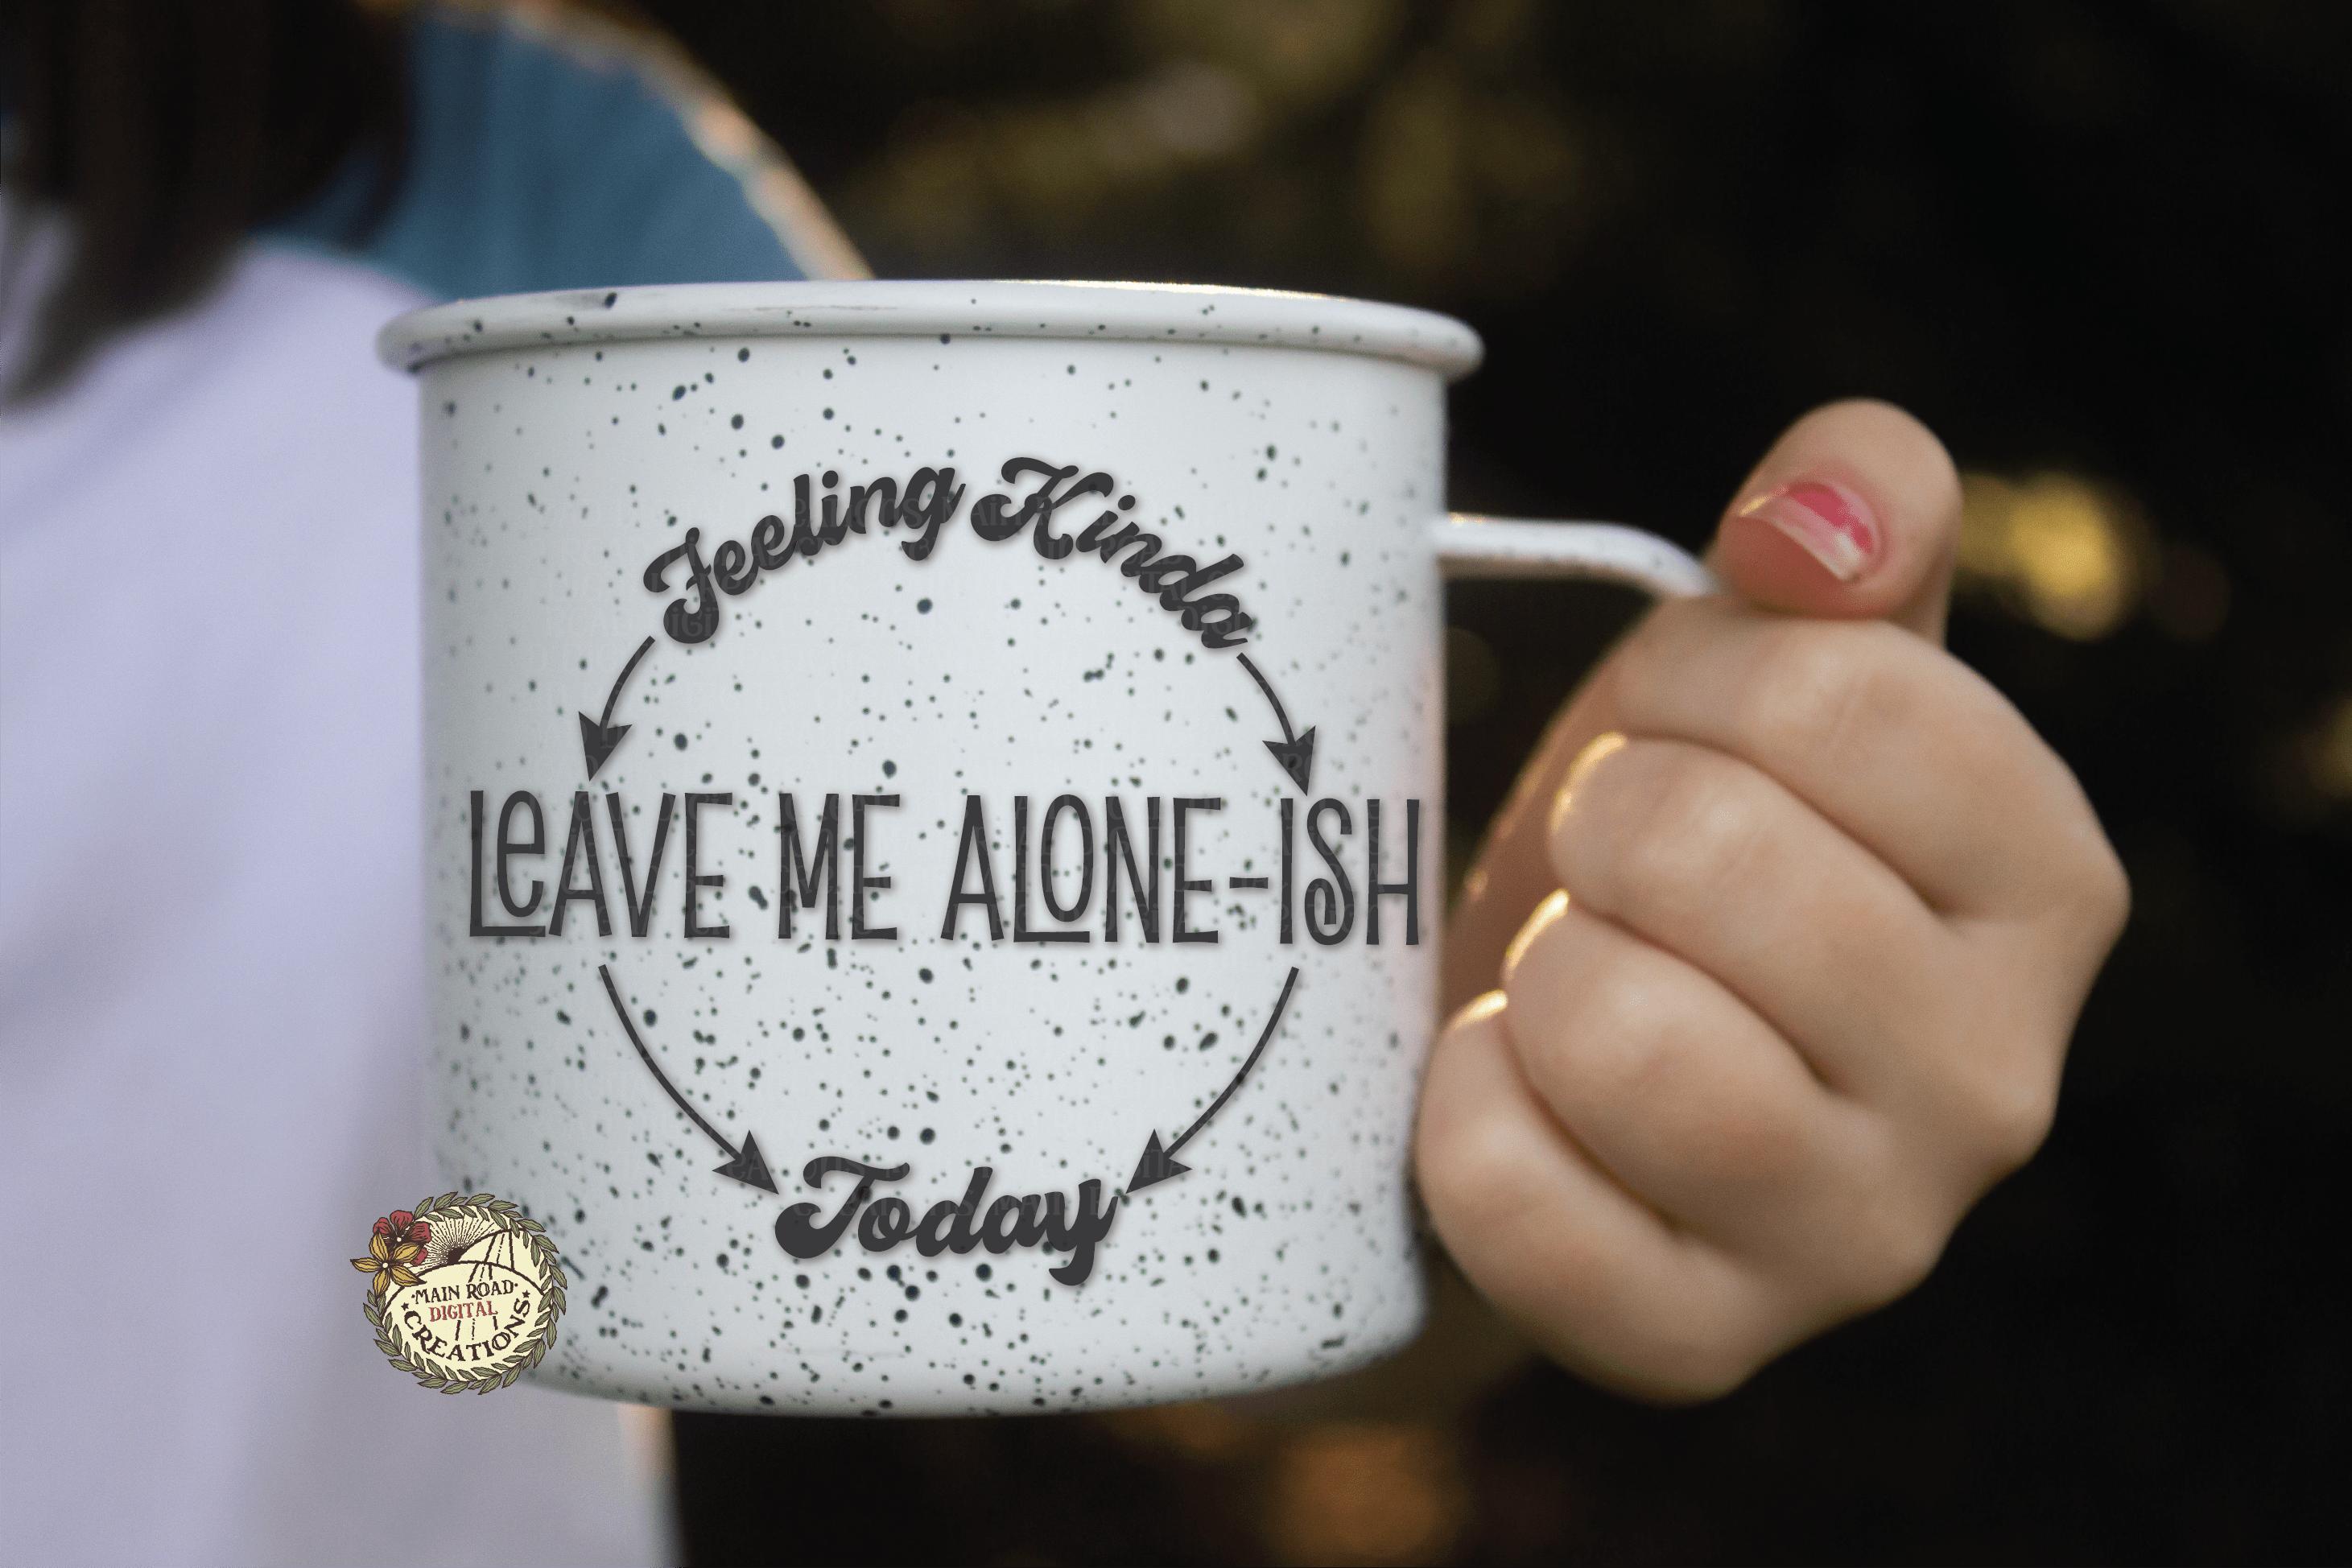 free feeling kinda leave me alone-ish today svg on mug